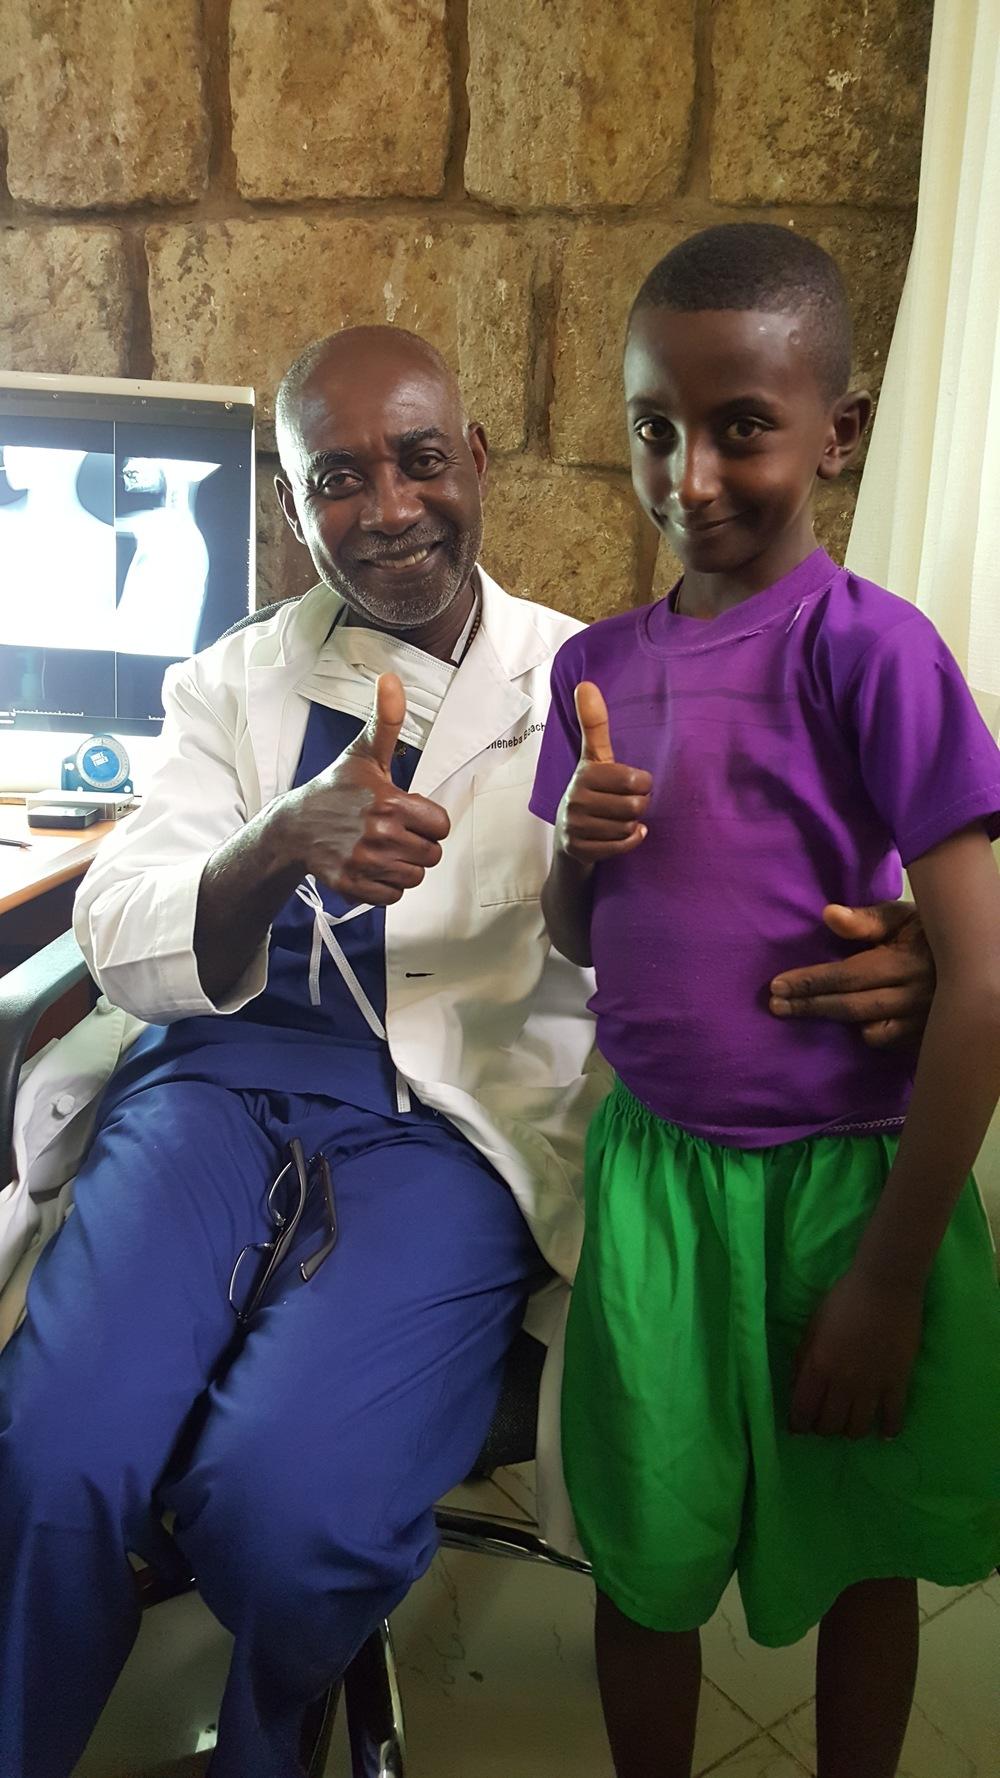 Prof. Boachie-Adjei and FOCOS patient Gabriel